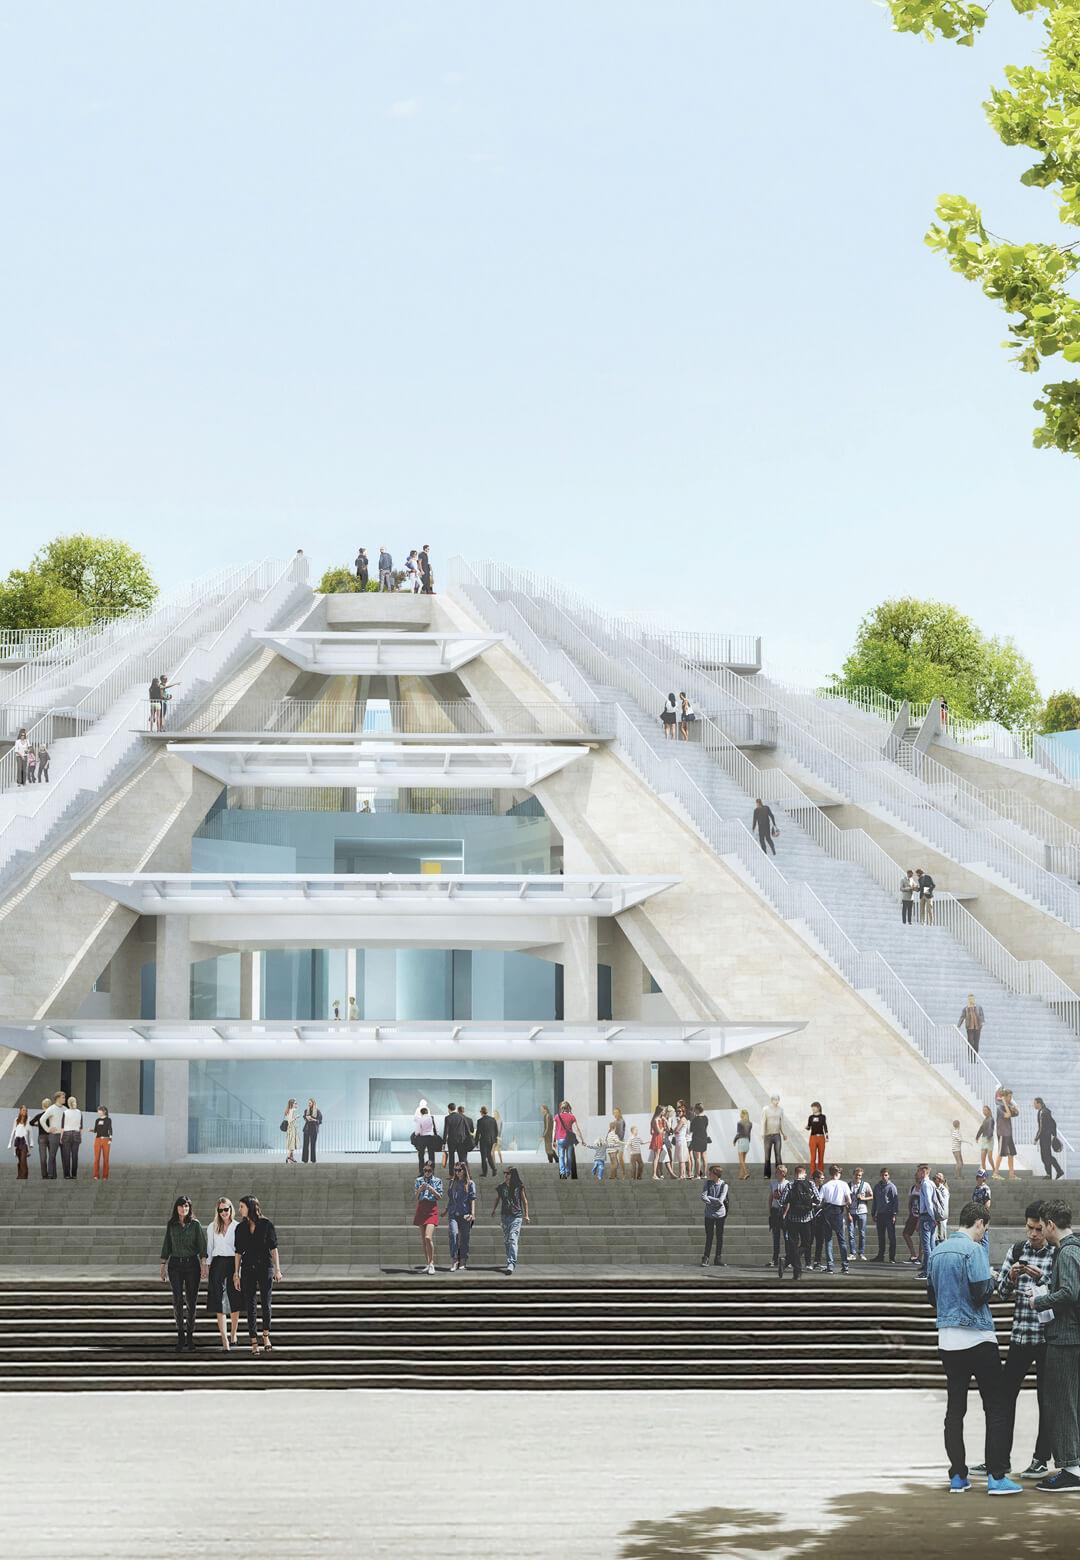 MVRDV will renovate the Pyramid of Tirana in Albania| Pyramid of Tirana designed by MVRDV | STIRworld